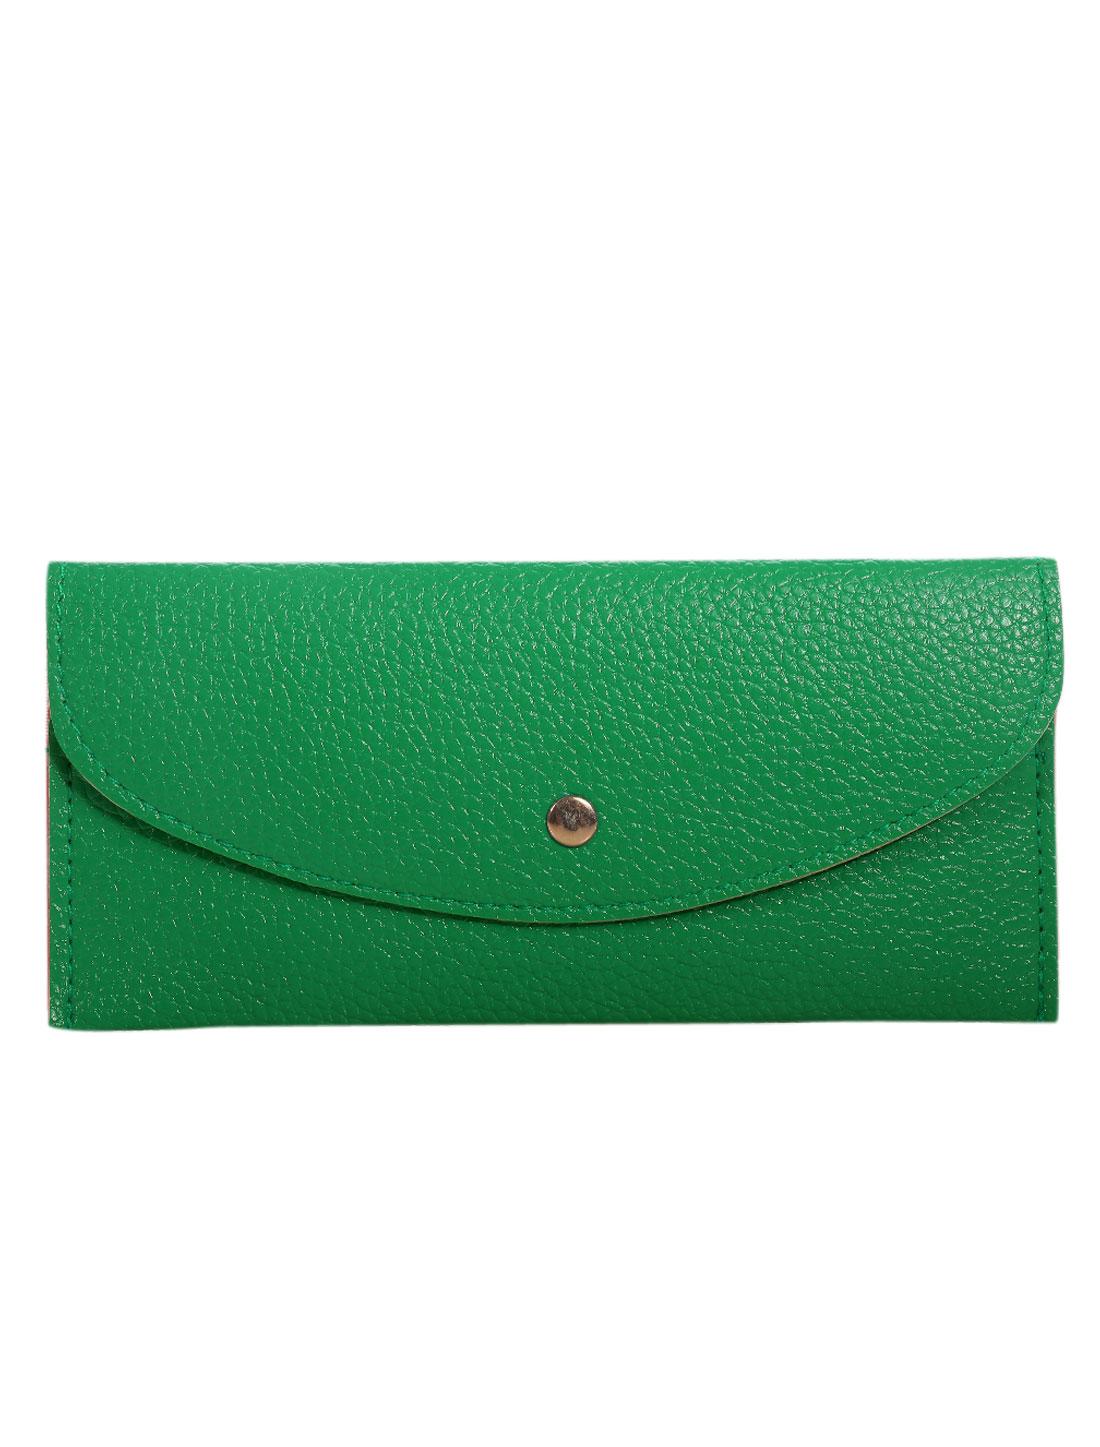 Unisex Snap-fastening Flap Textured Wallet Green